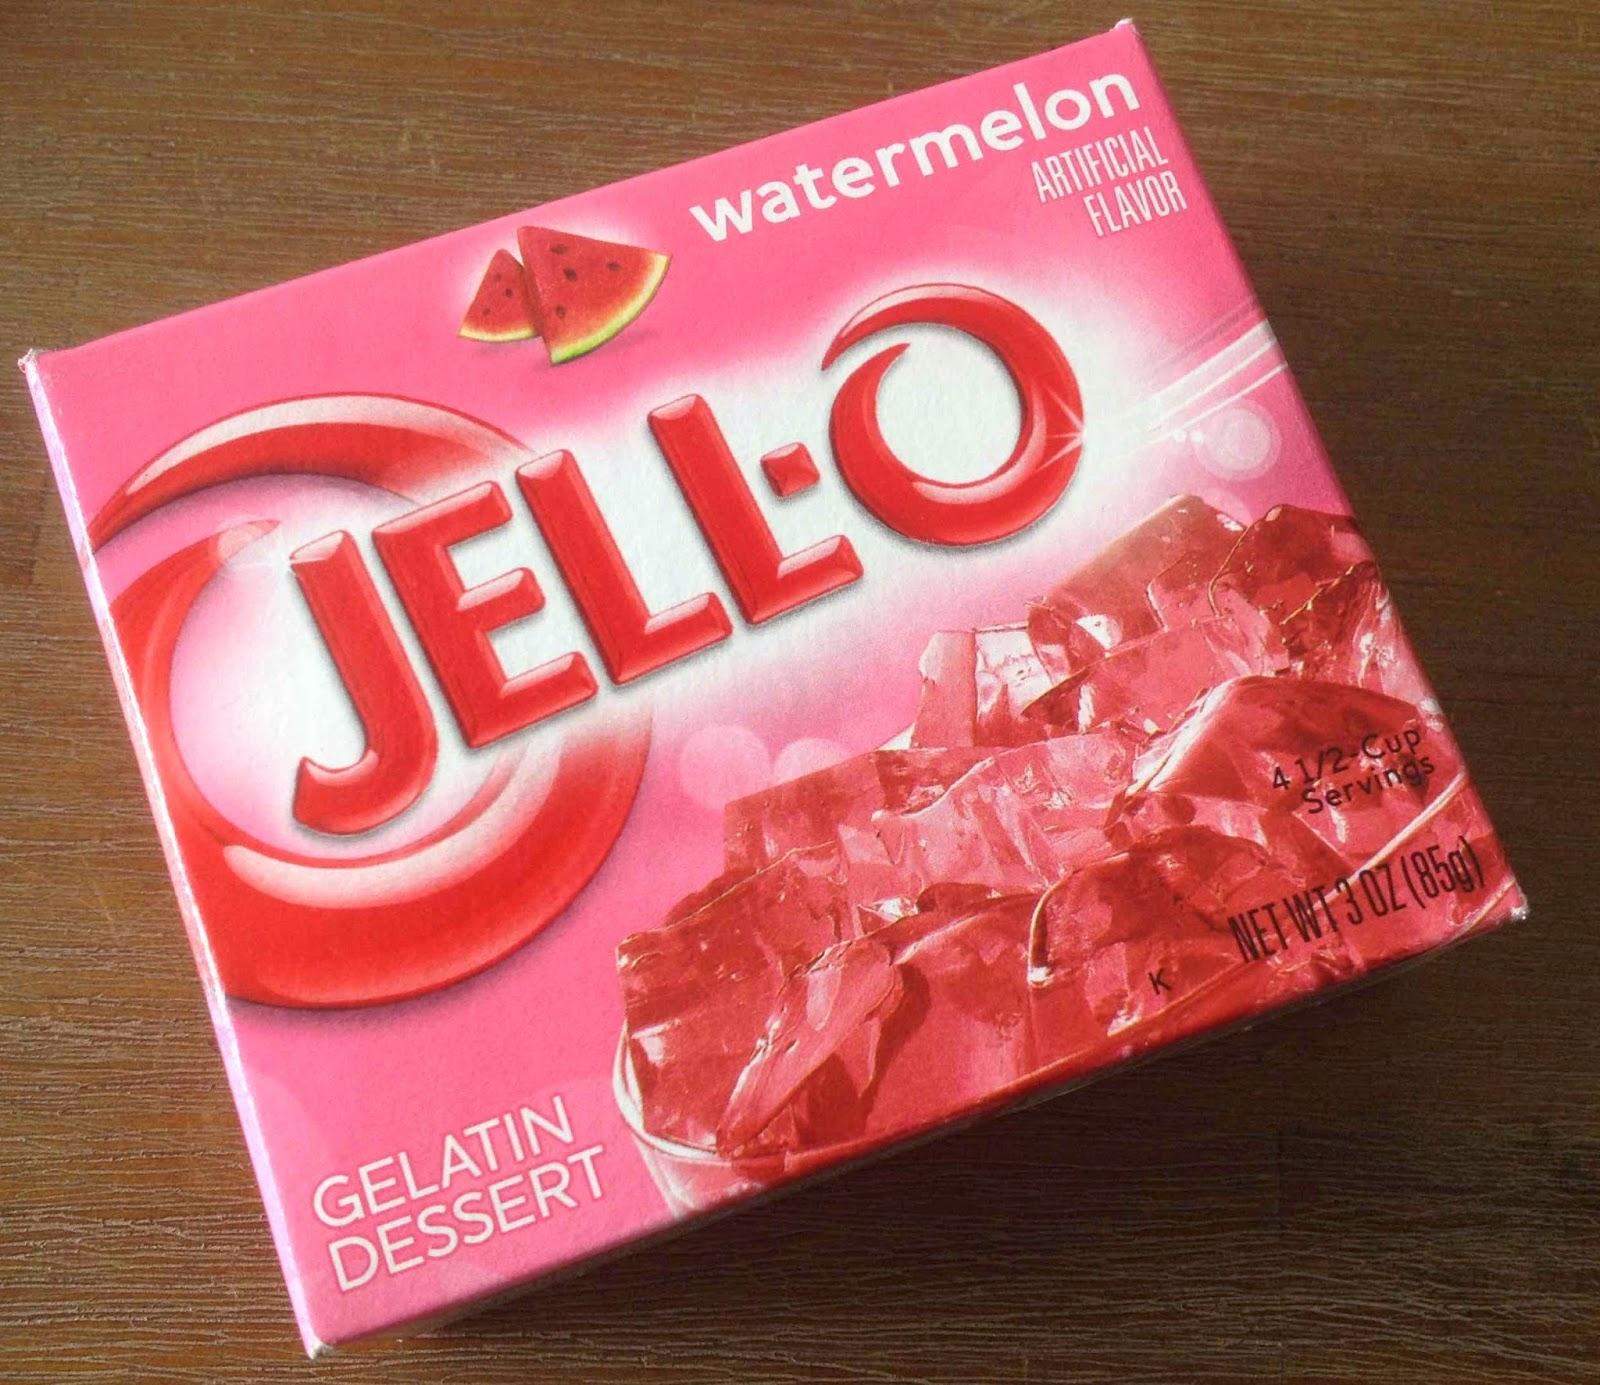 Jell-o watermelon